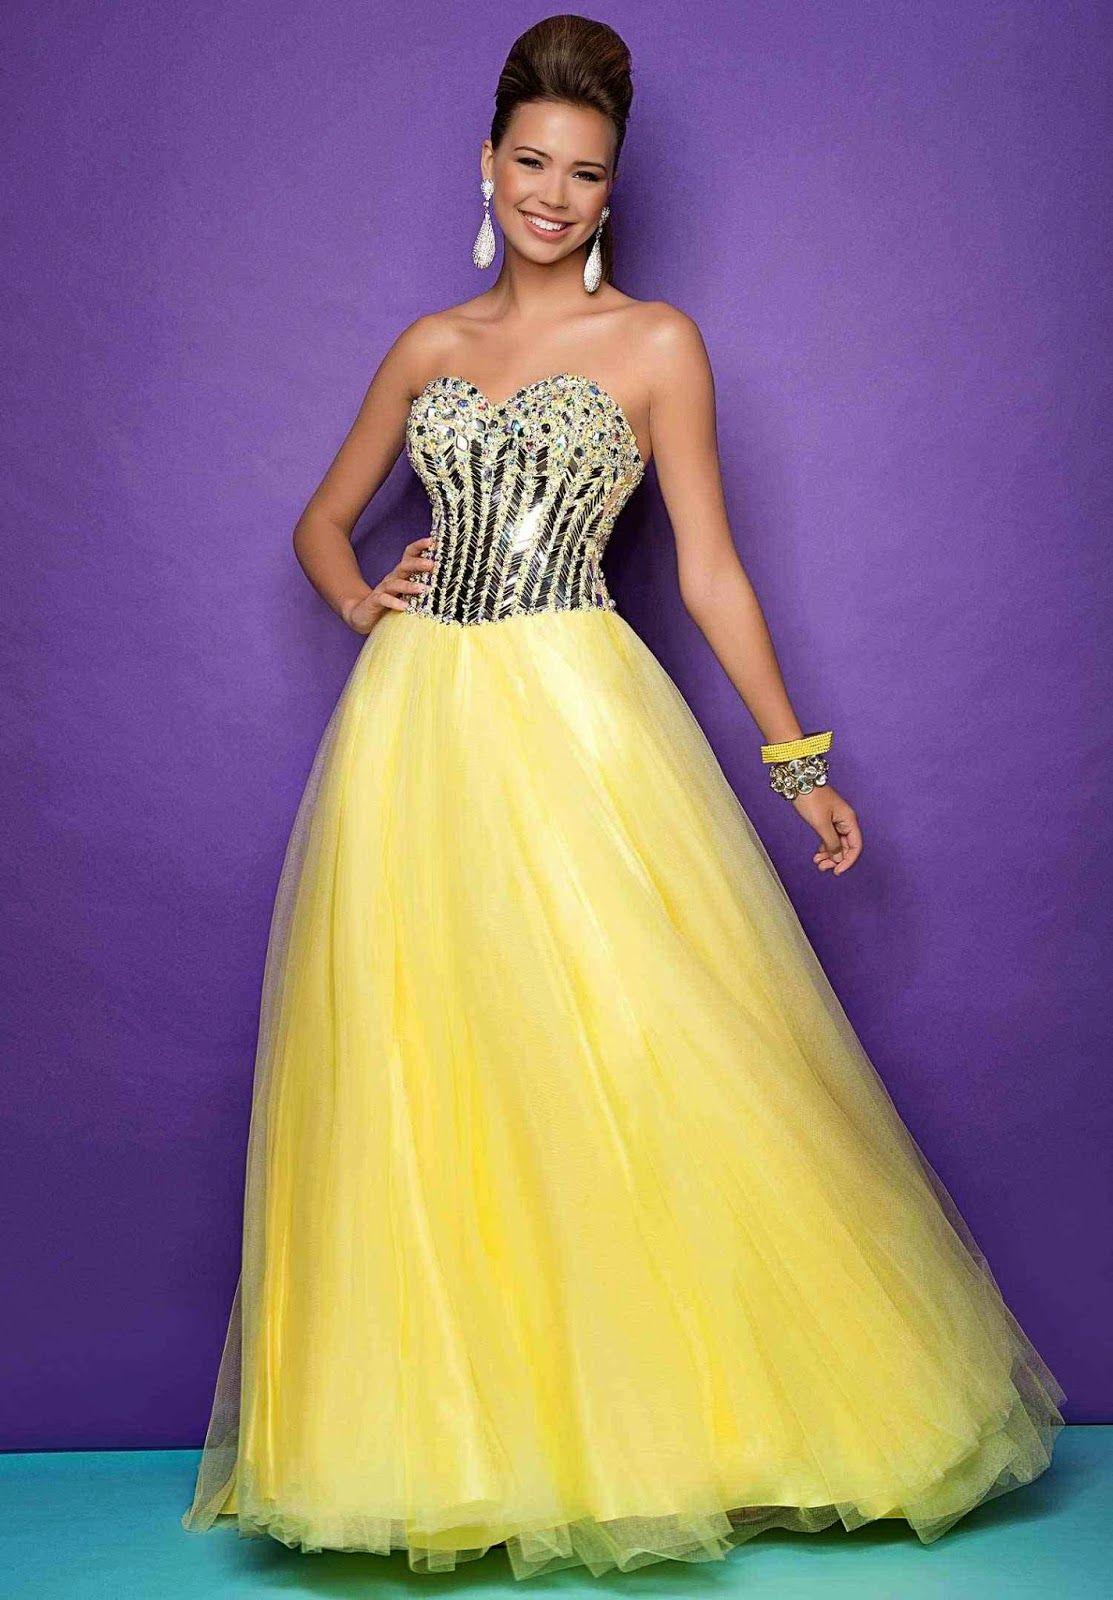 Vestidos de fiesta en oferta | Bodas | Pinterest | Vestidos de ...